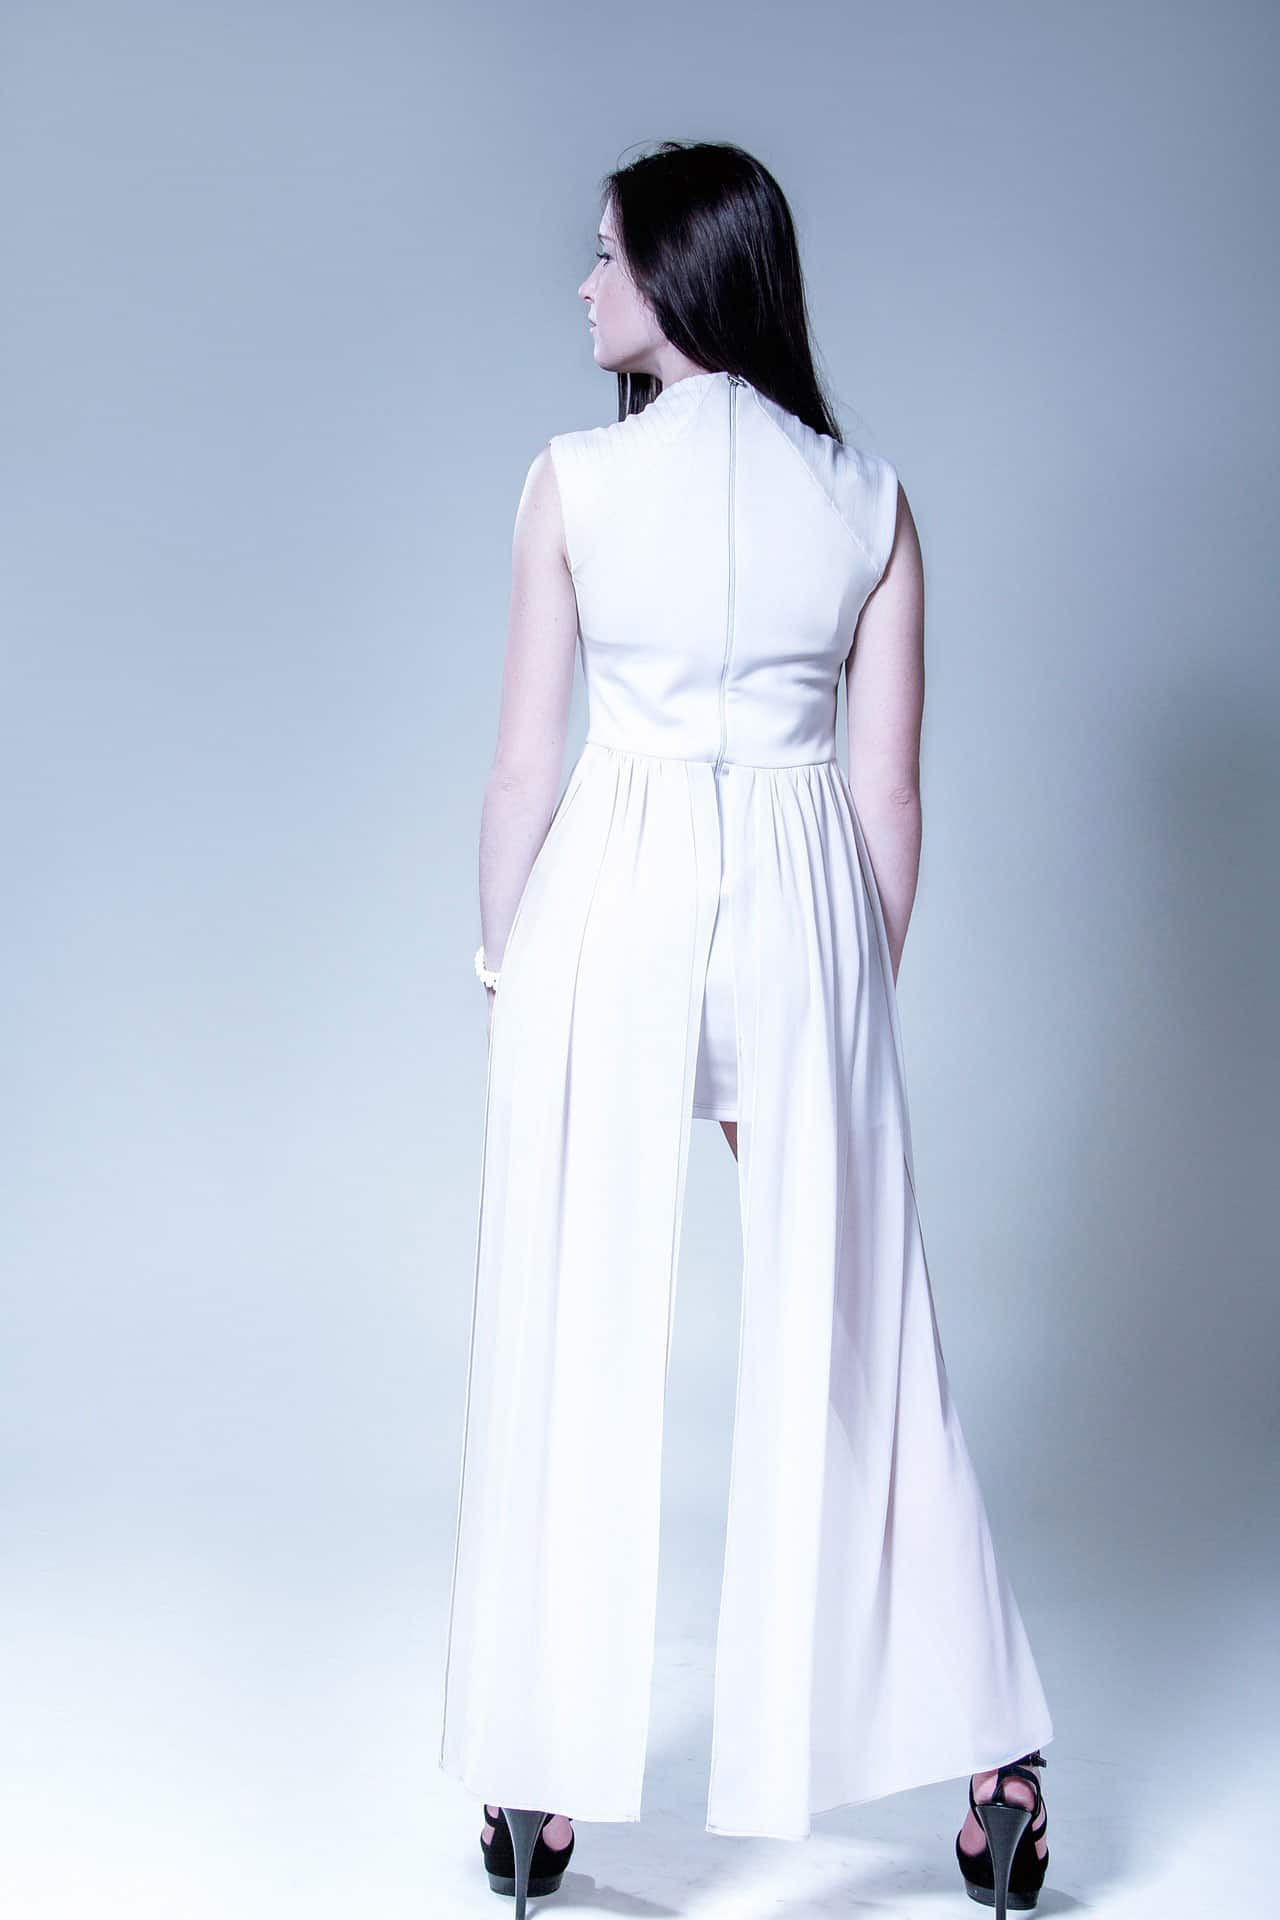 Fotografie Frau im Kleid